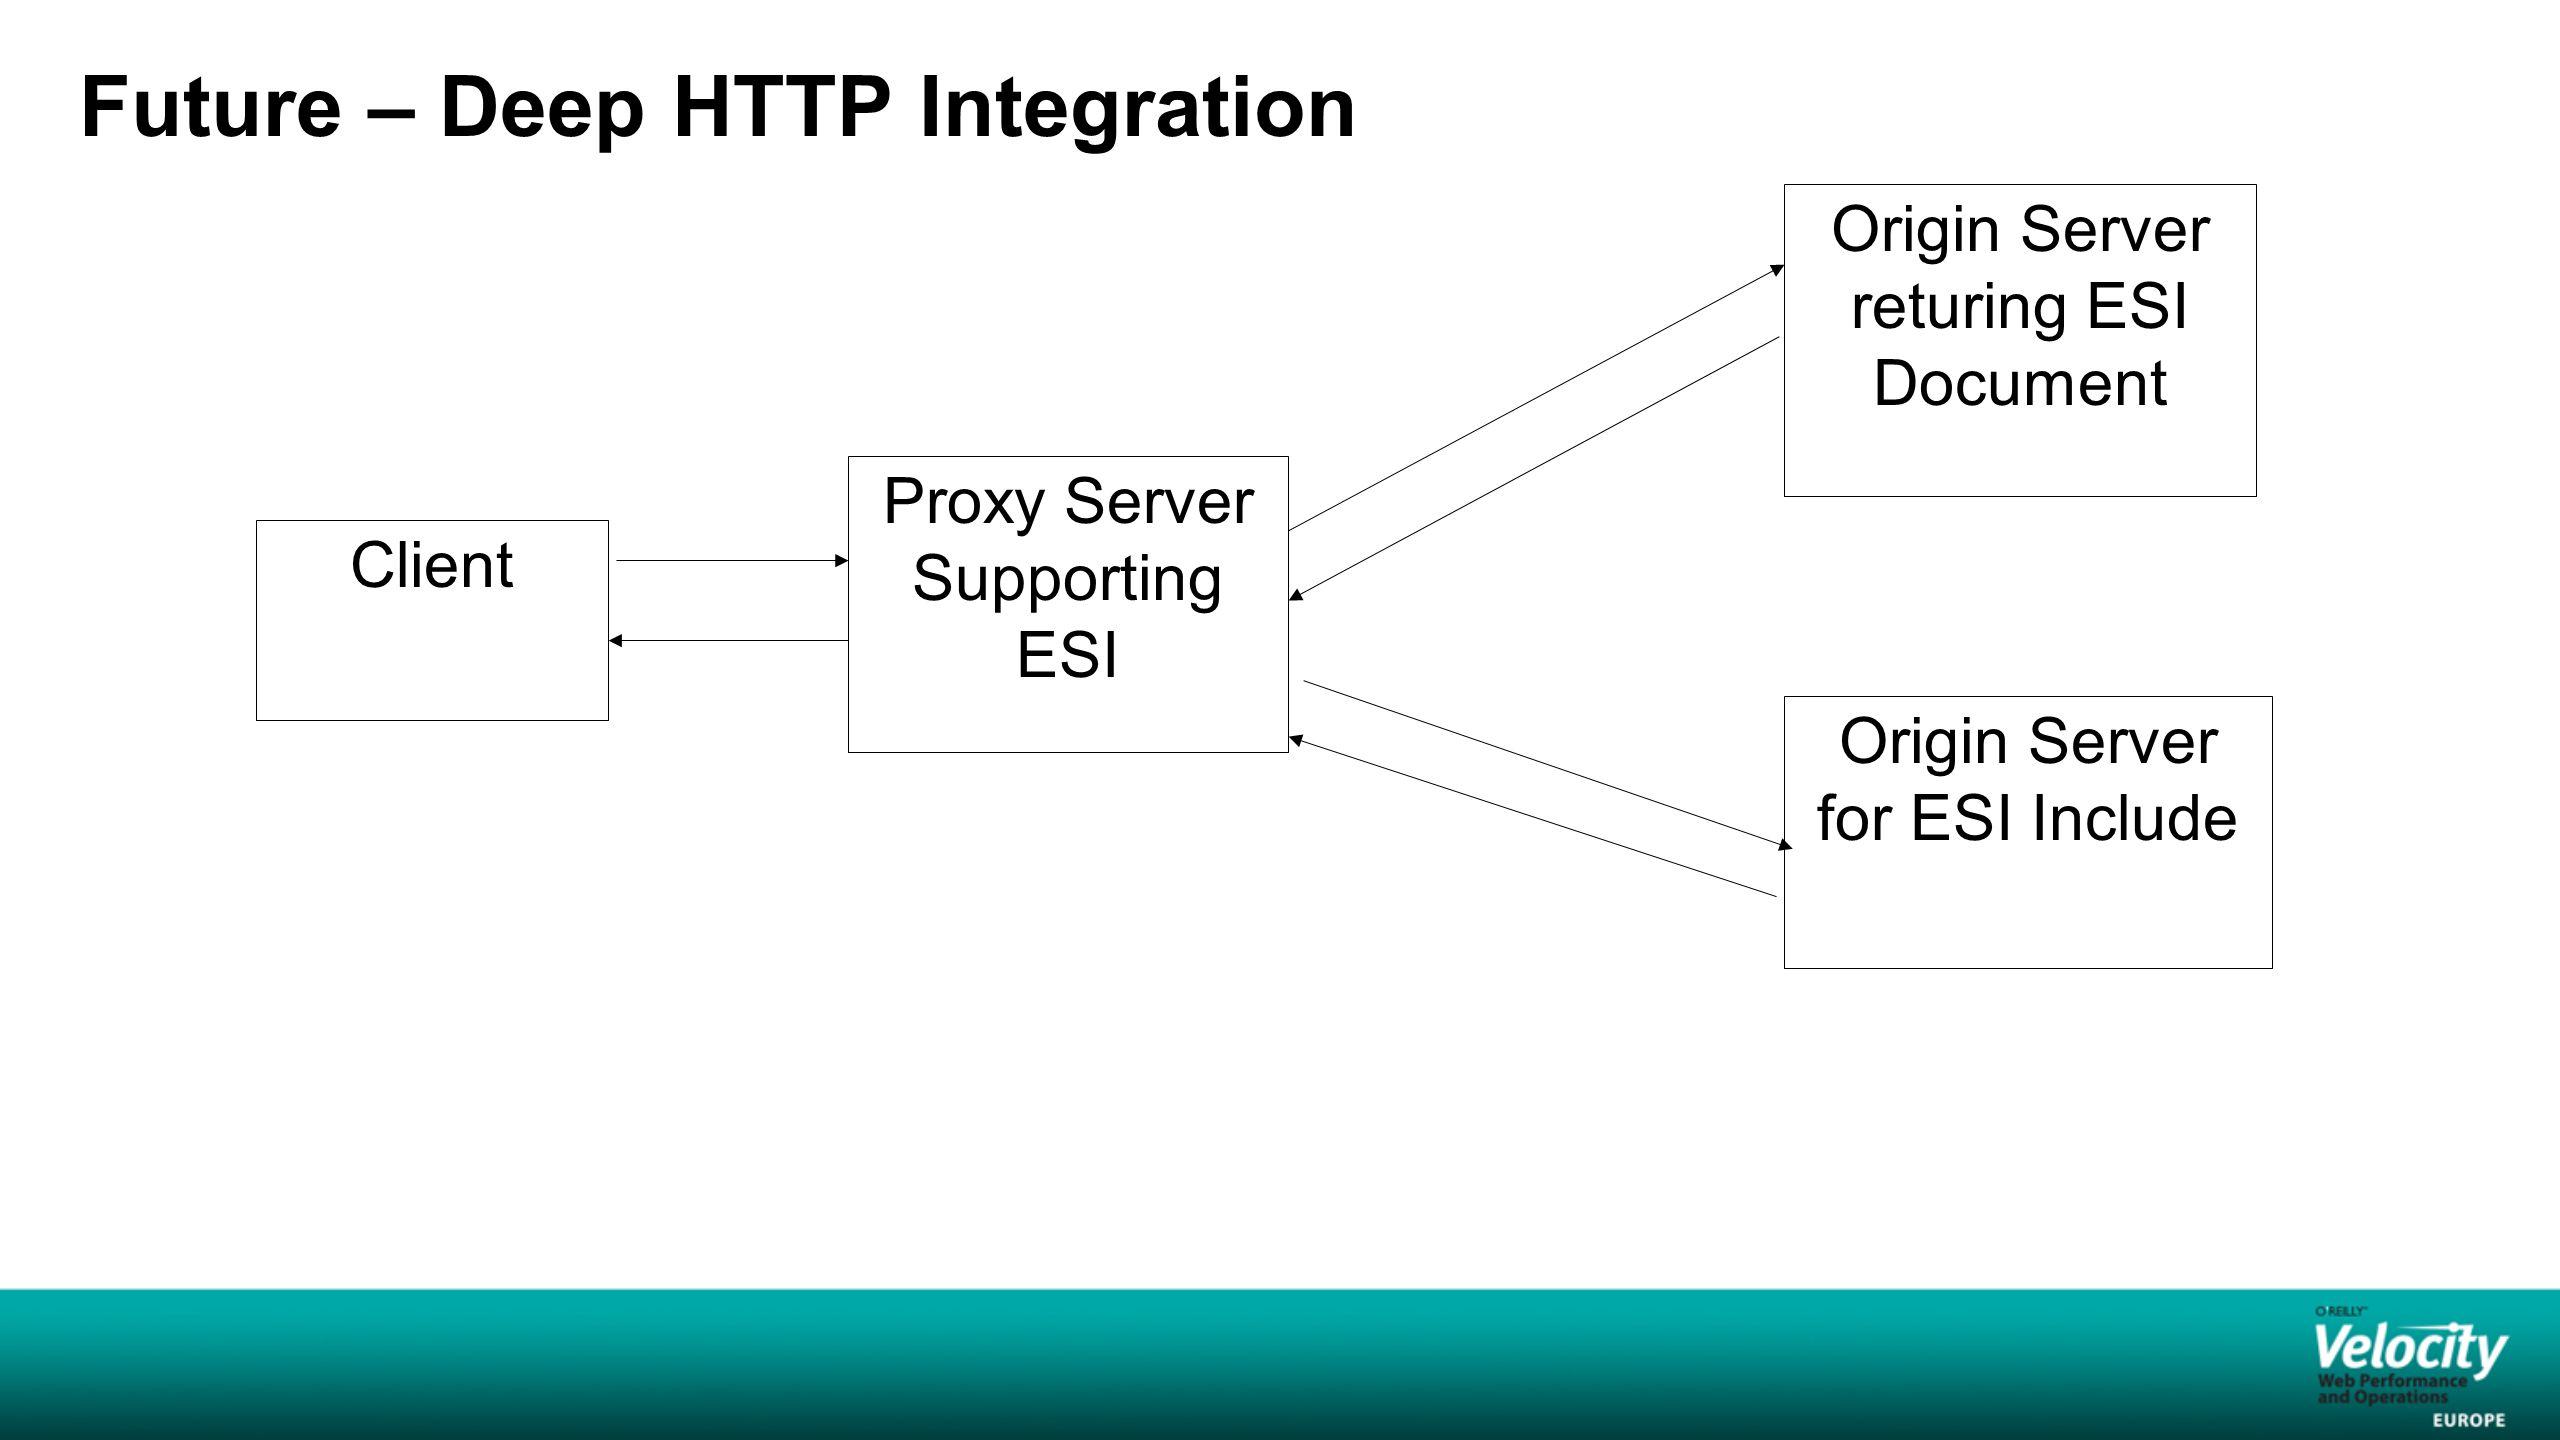 Future – Deep HTTP Integration Client Proxy Server Supporting ESI Origin Server returing ESI Document Origin Server for ESI Include